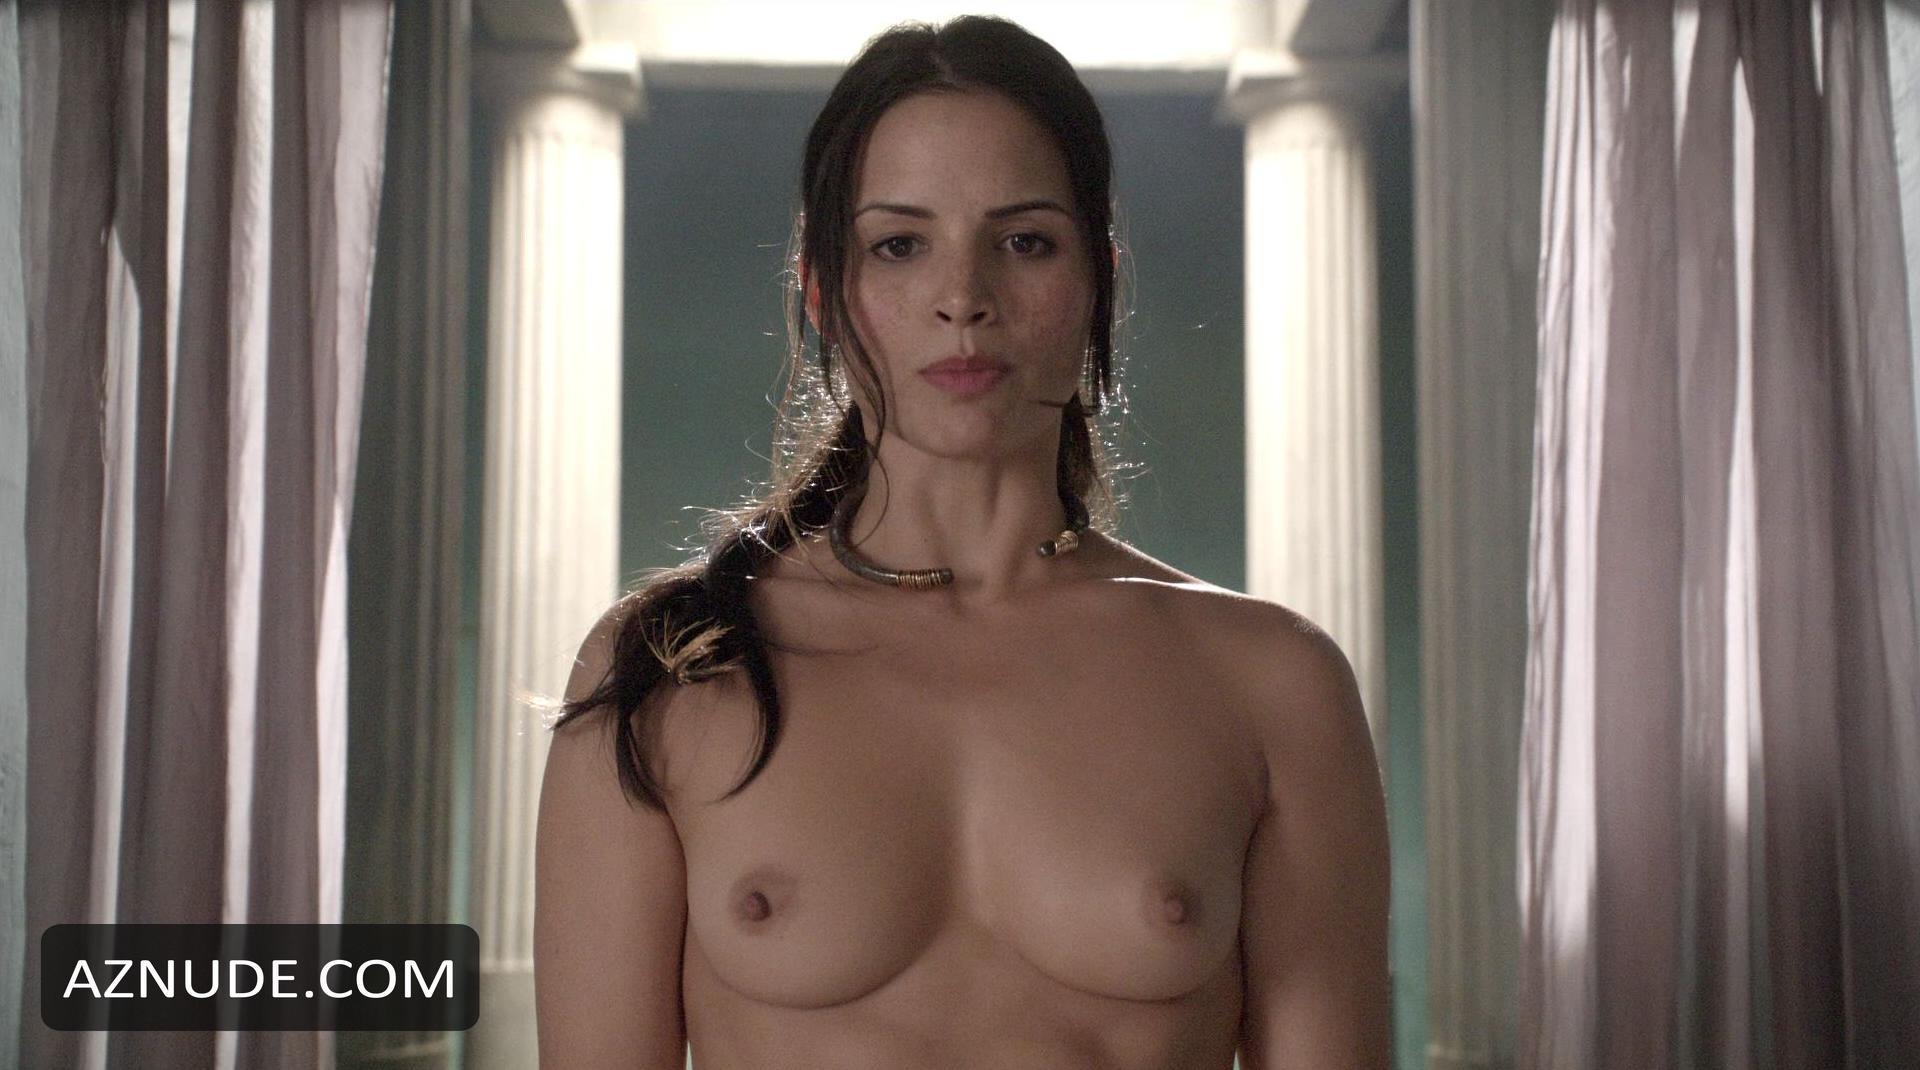 Nesty vagina porn sexy